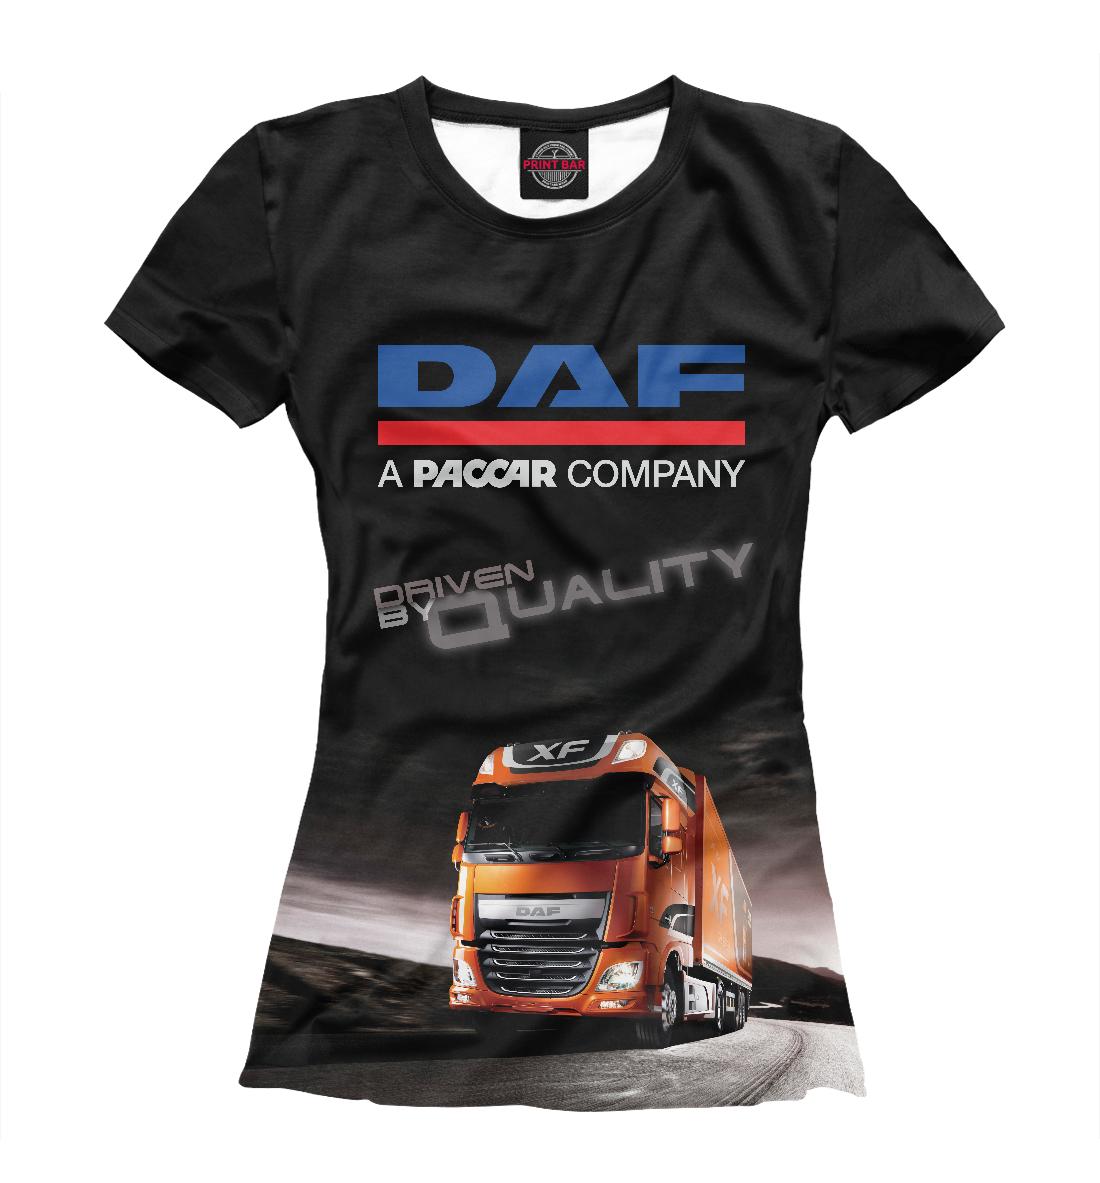 Купить DAF - Driven By Quality, Printbar, Футболки, GRZ-912734-fut-1